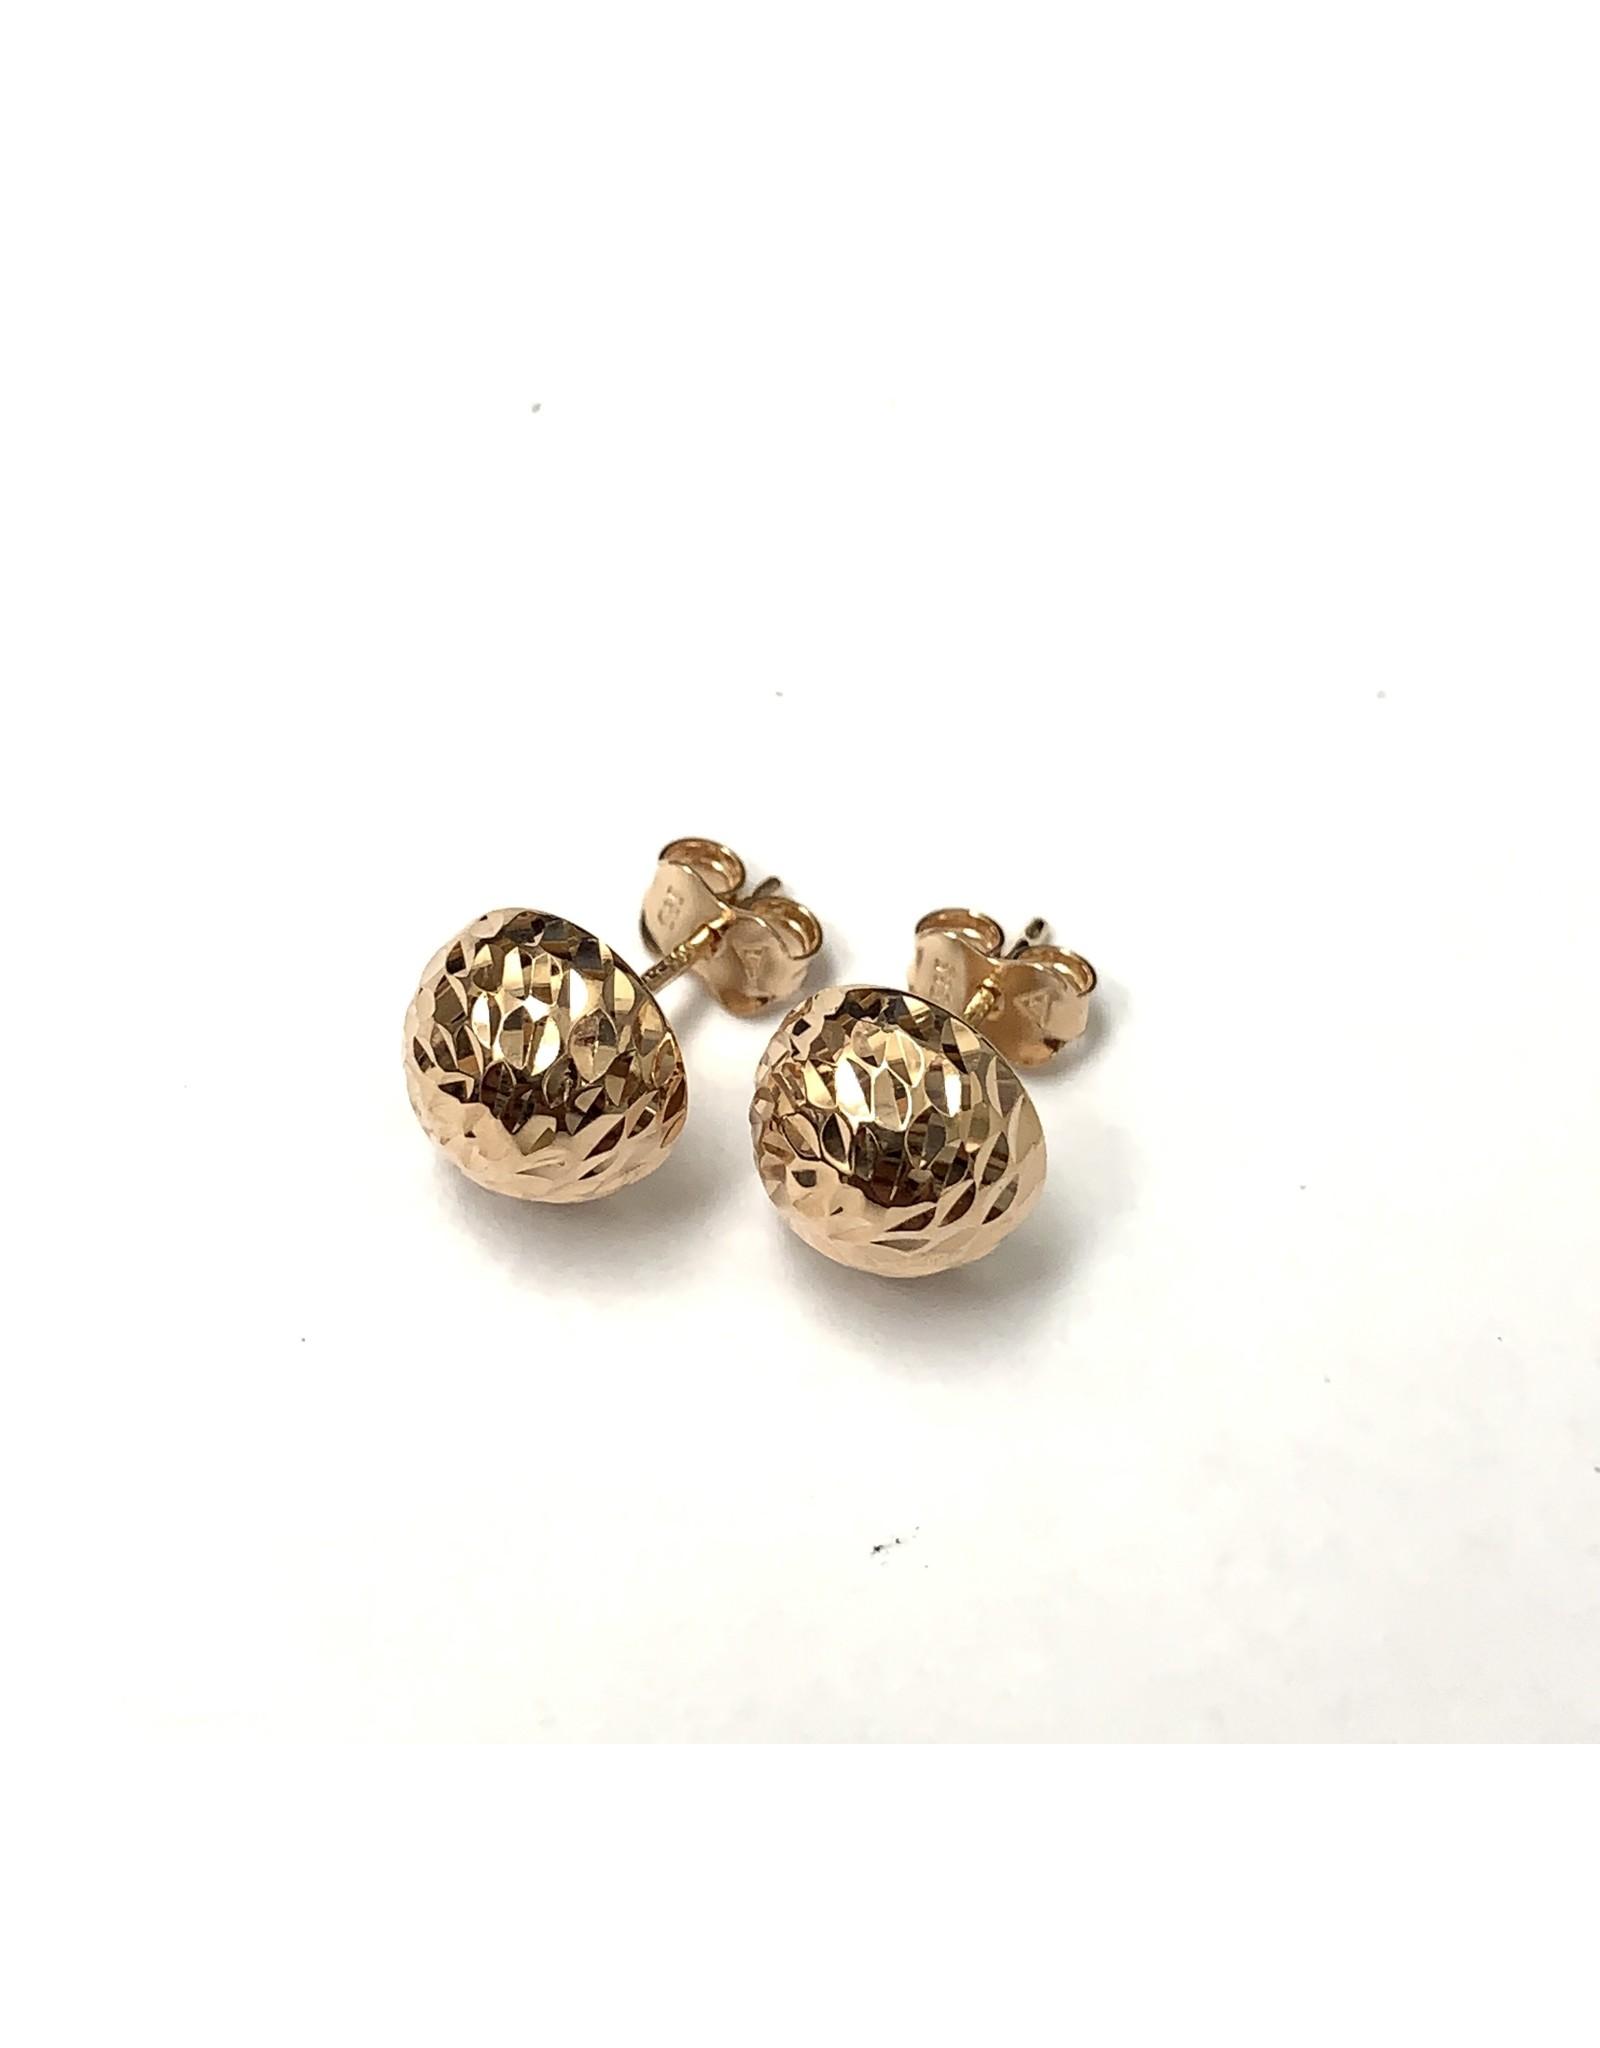 9mm Half-Ball Stud Earrings 14KR